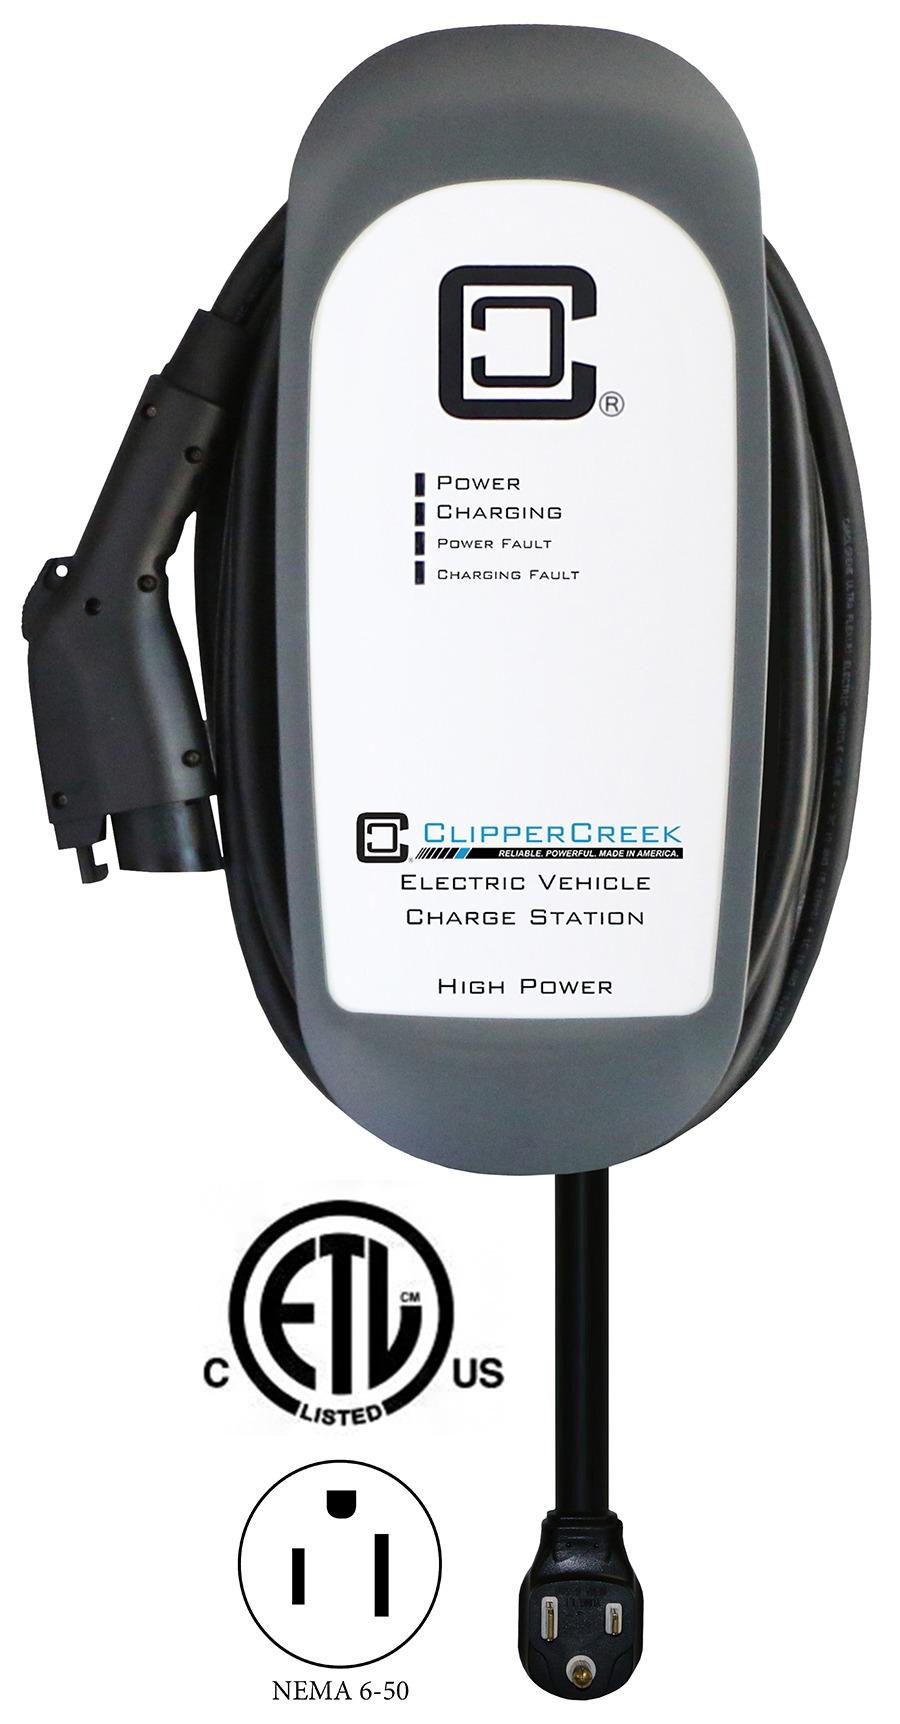 hight resolution of 240v nema plug wiring diagram